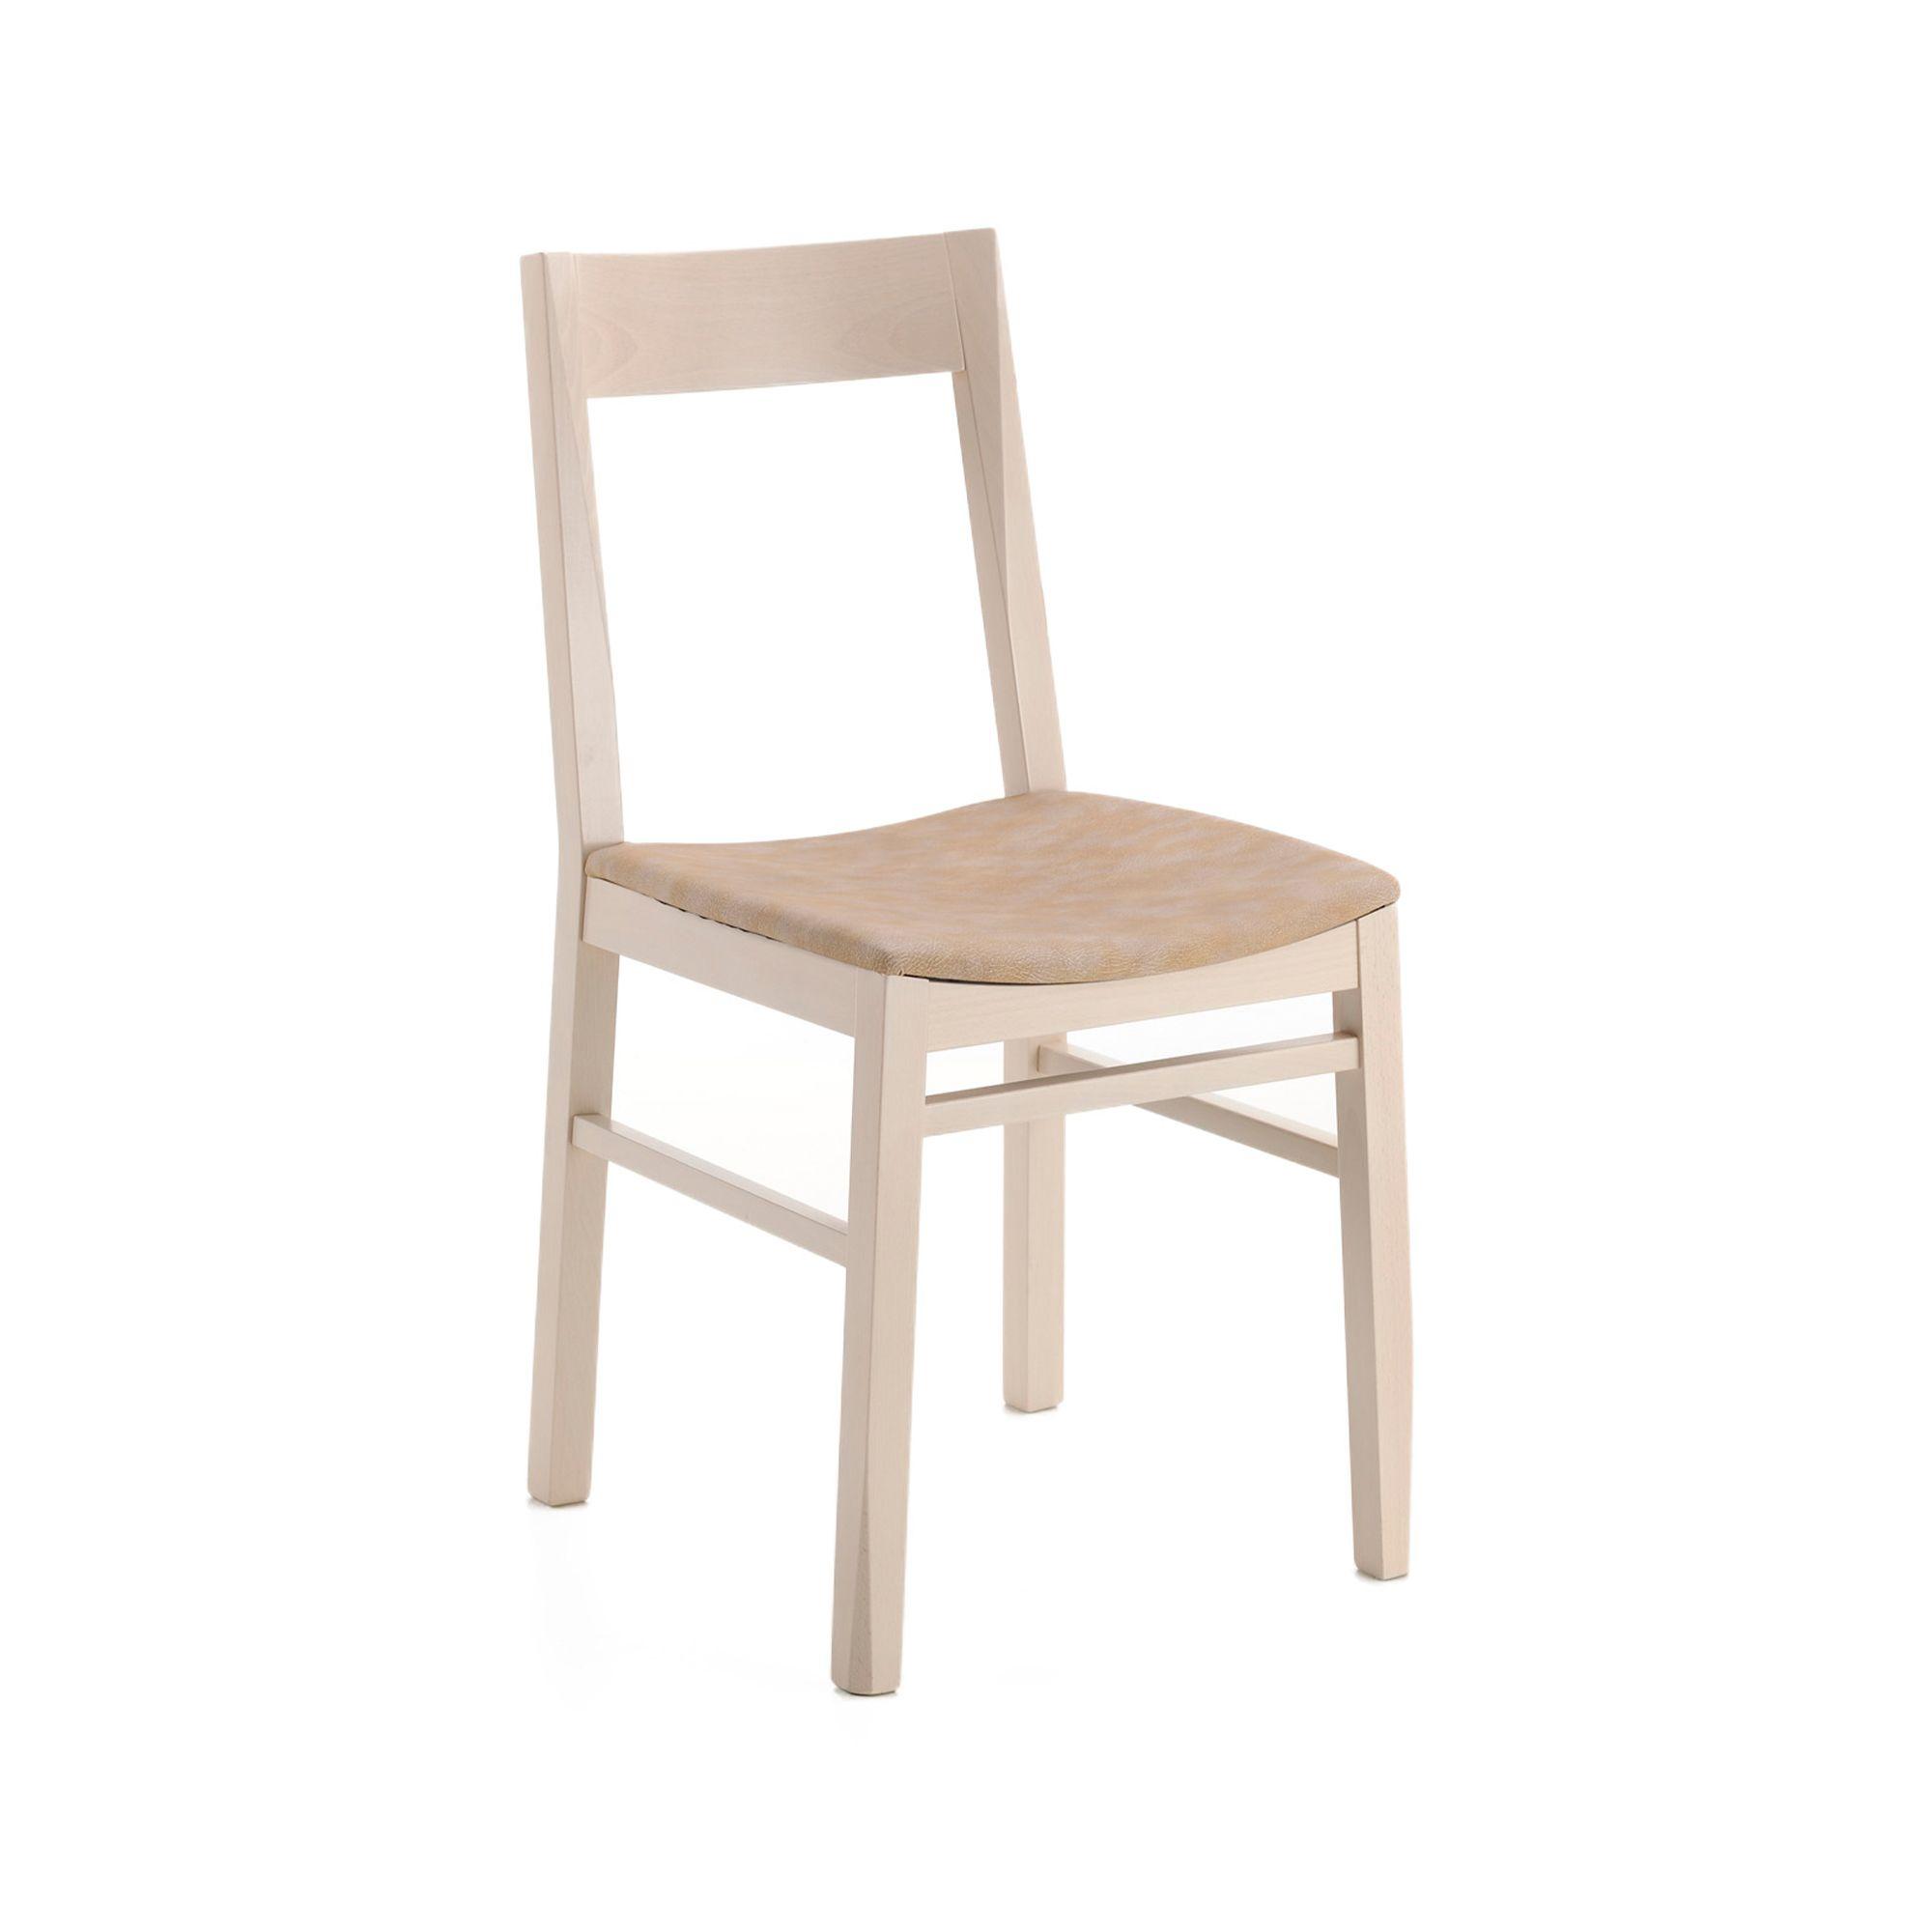 Model 874 chair in modern style